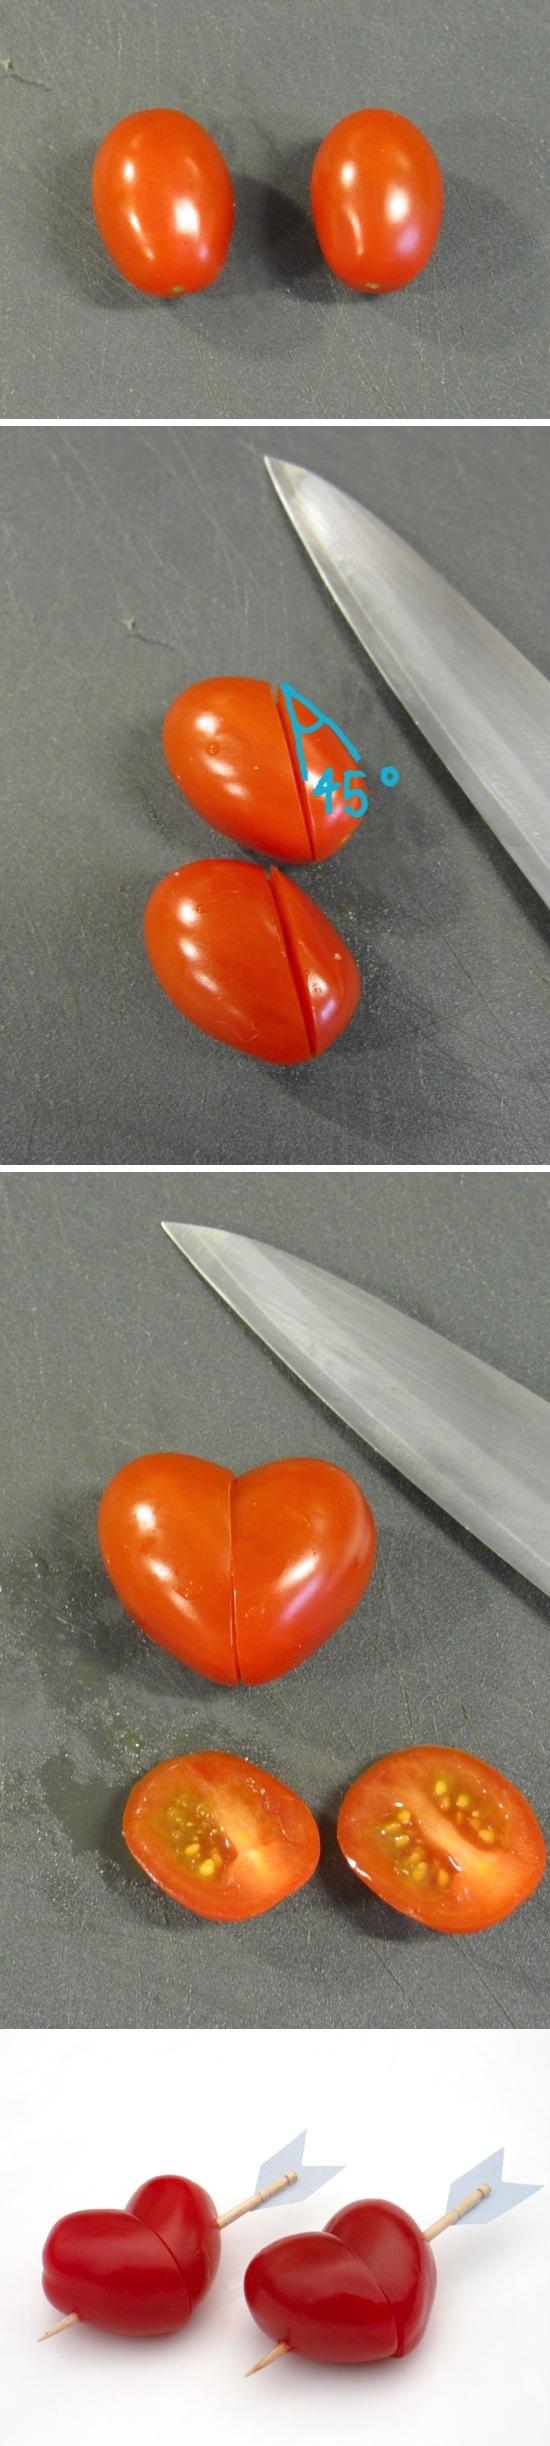 hjertetomater